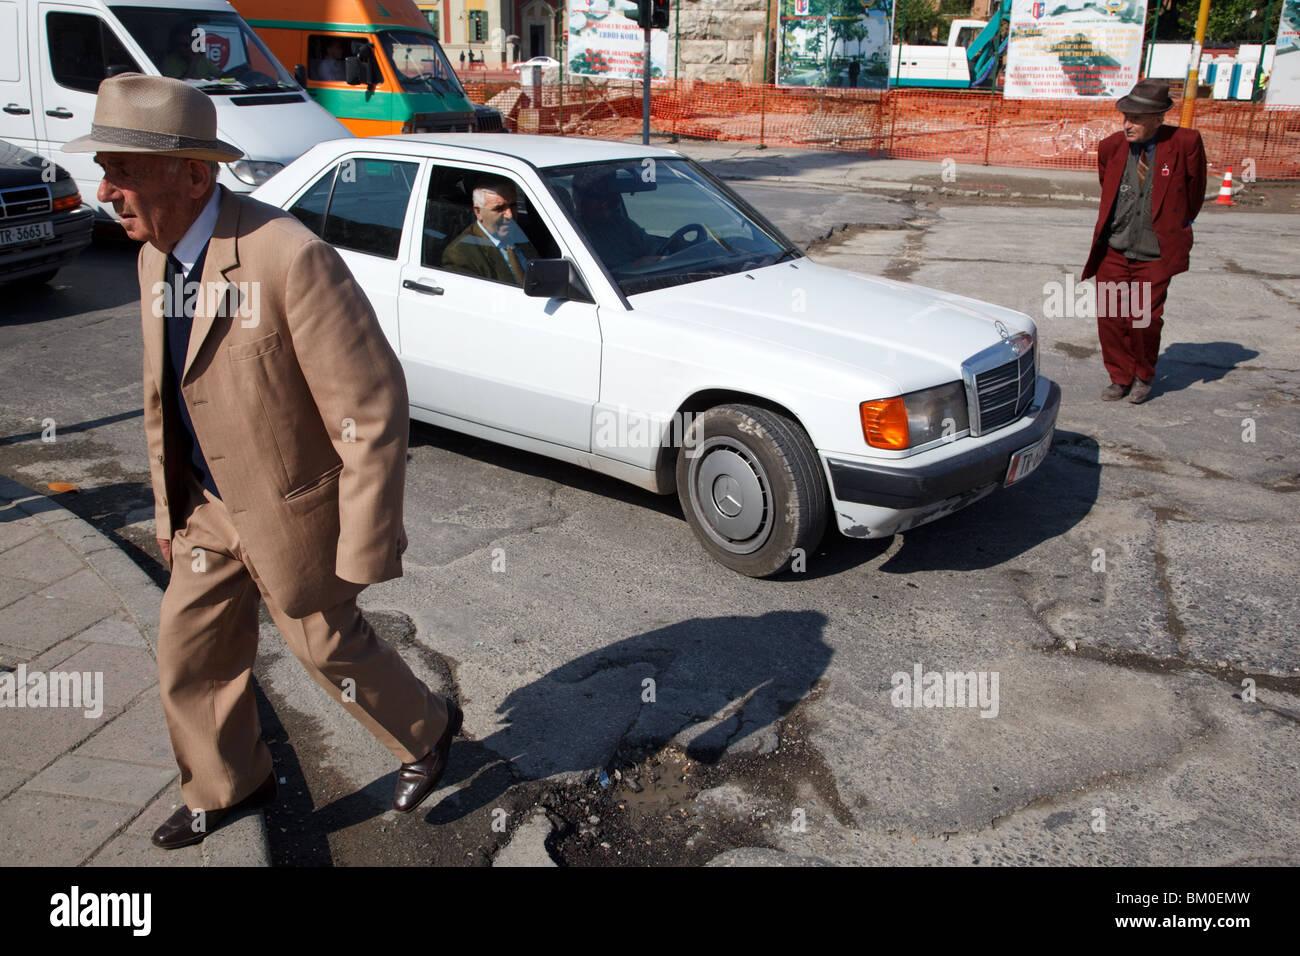 elegant old men and Mercedes 190 car in Tirana, the capital of Albania. - Stock Image